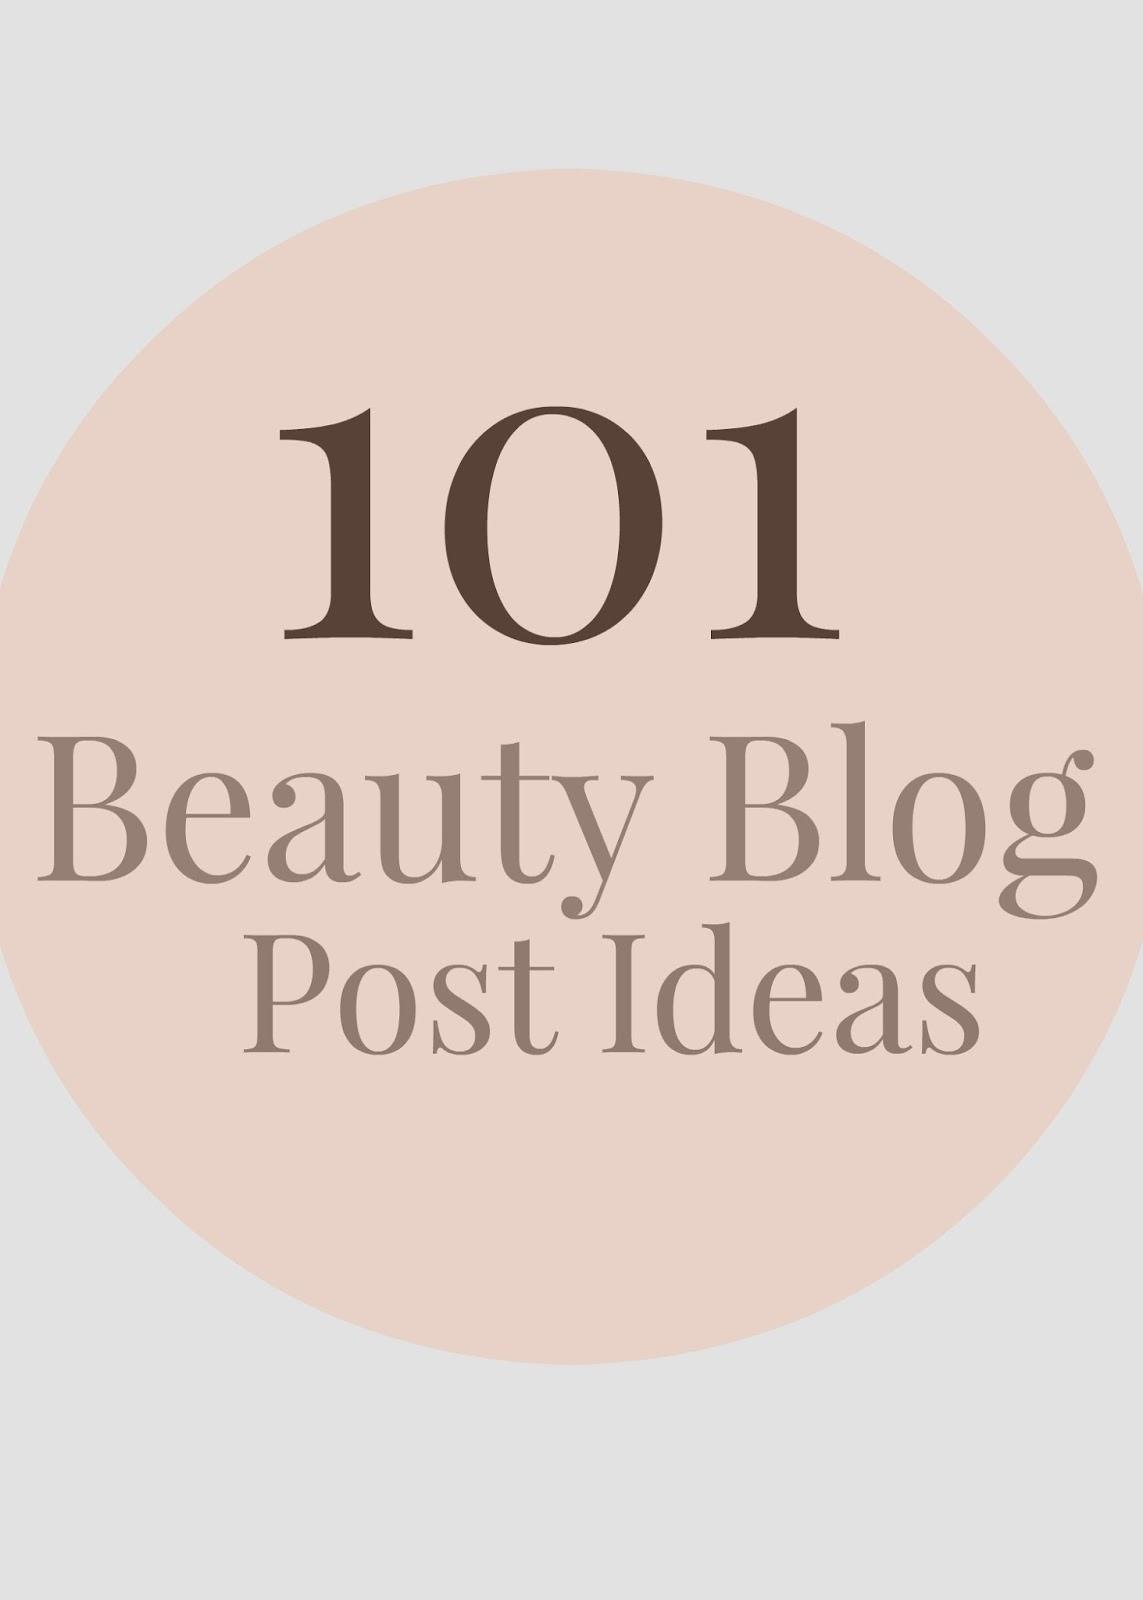 101 beauty blog post ideas tips